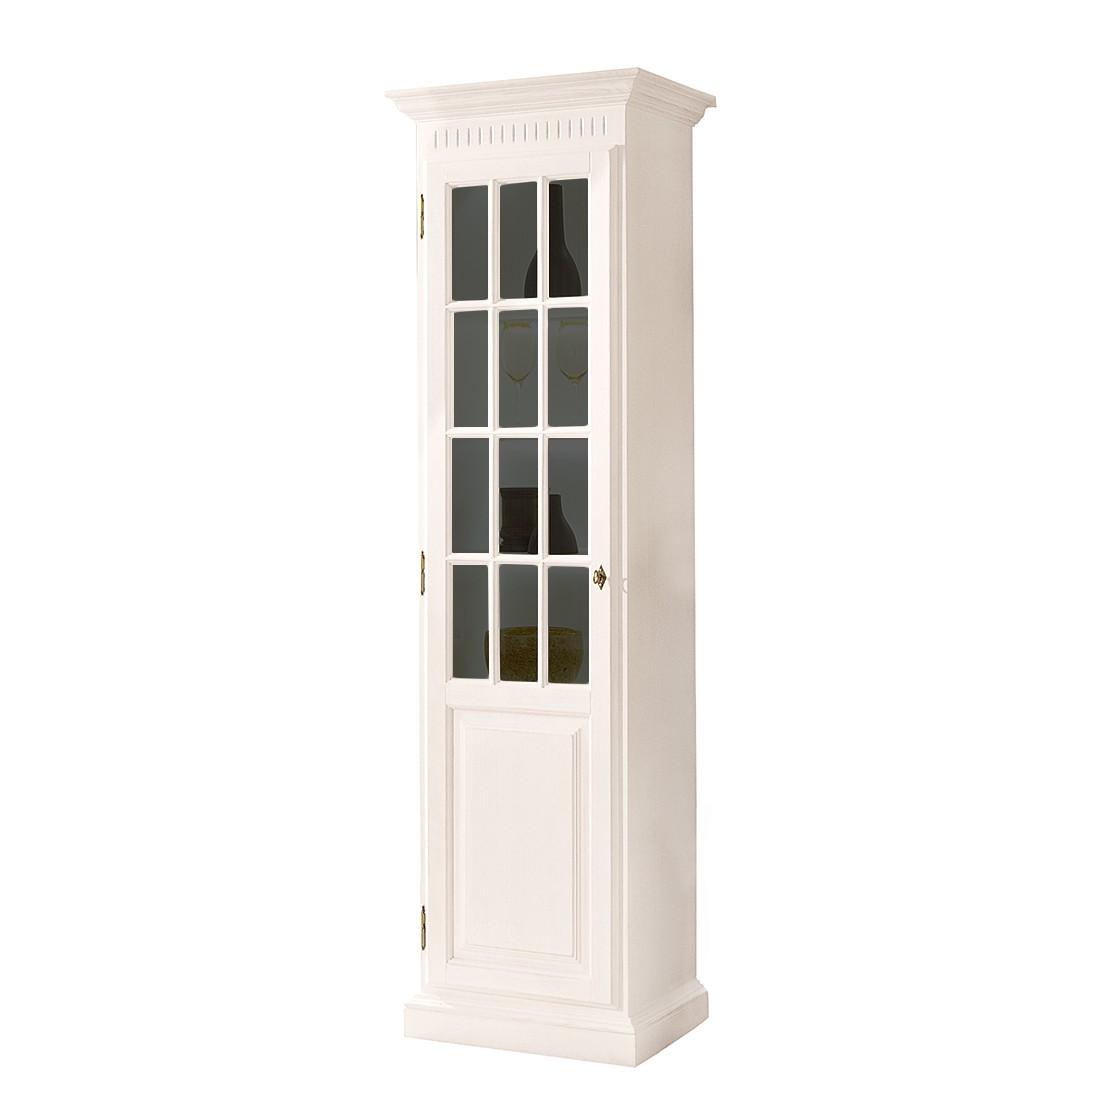 Armoire vitrine La Carlotta III - Pin massif - Crème - Sans éclairage, Landhaus Classic